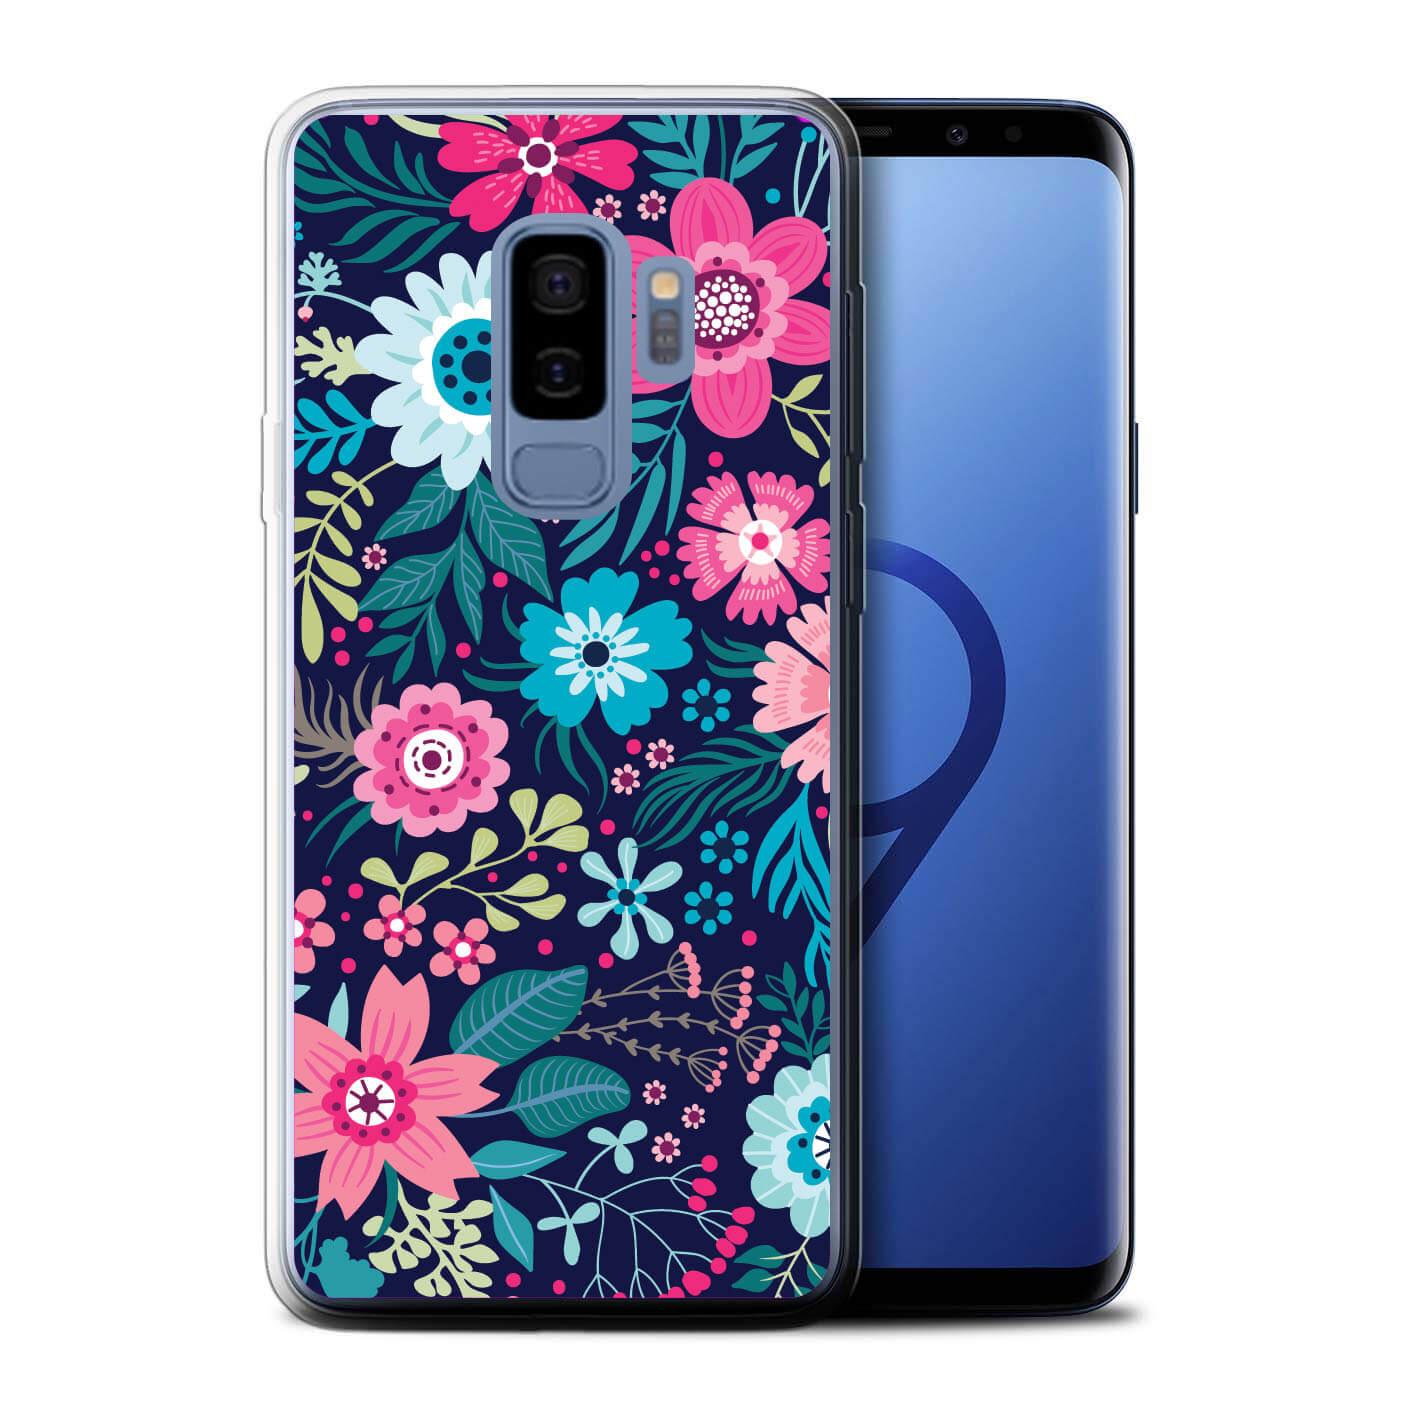 FORCELL MY ART kryt Samsung Galaxy S9 Plus FLORA